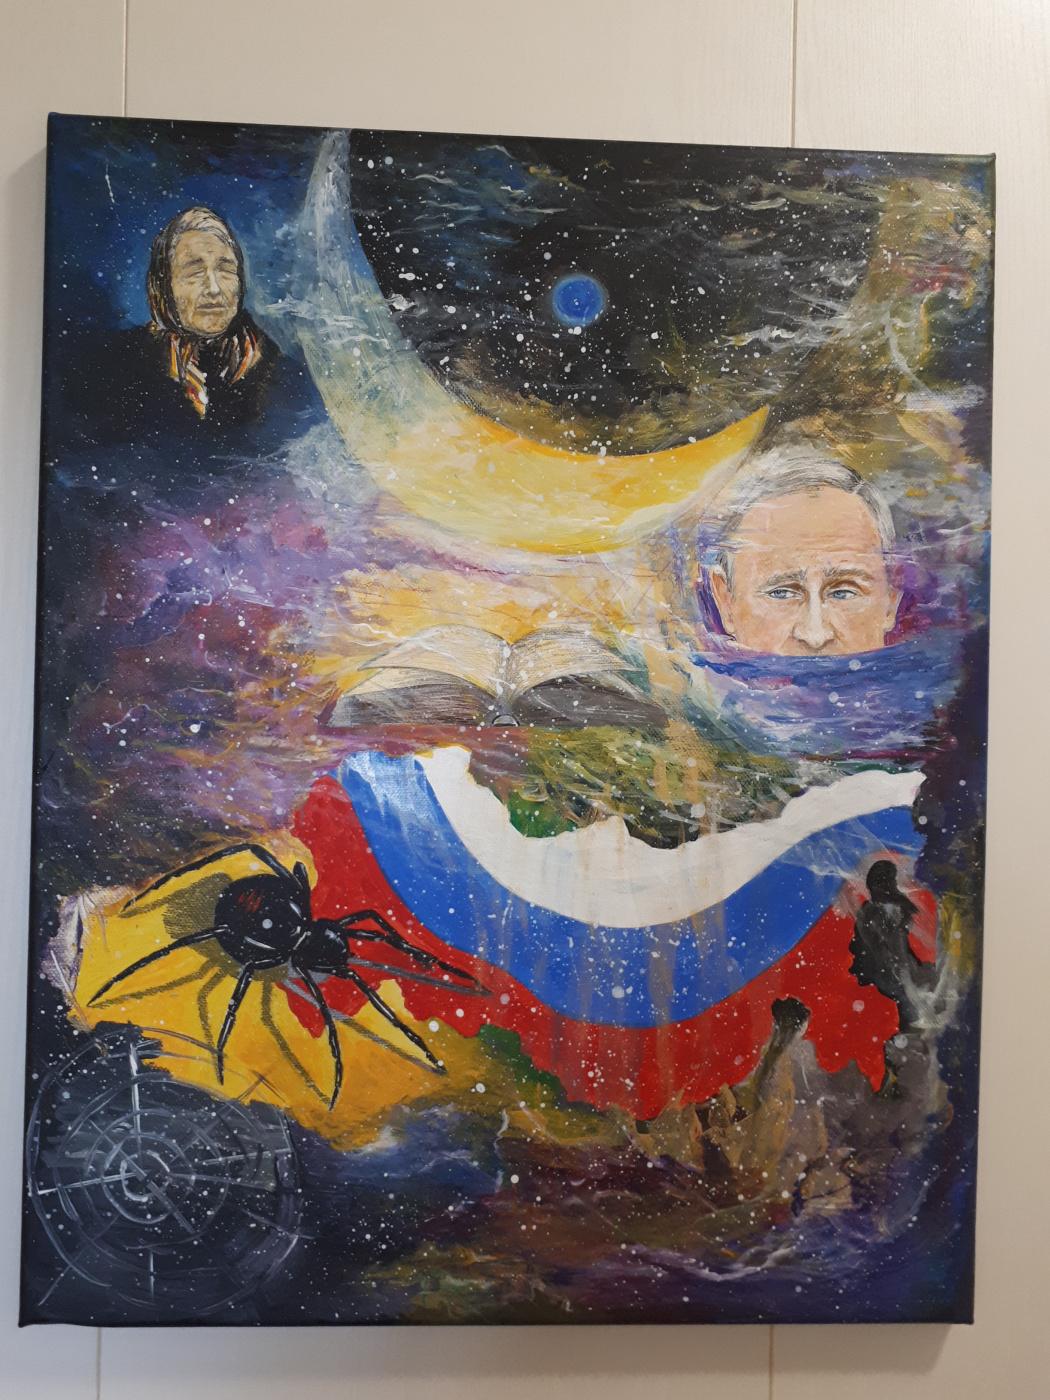 Patimat Tagirovna Magomedova. Mission Possible